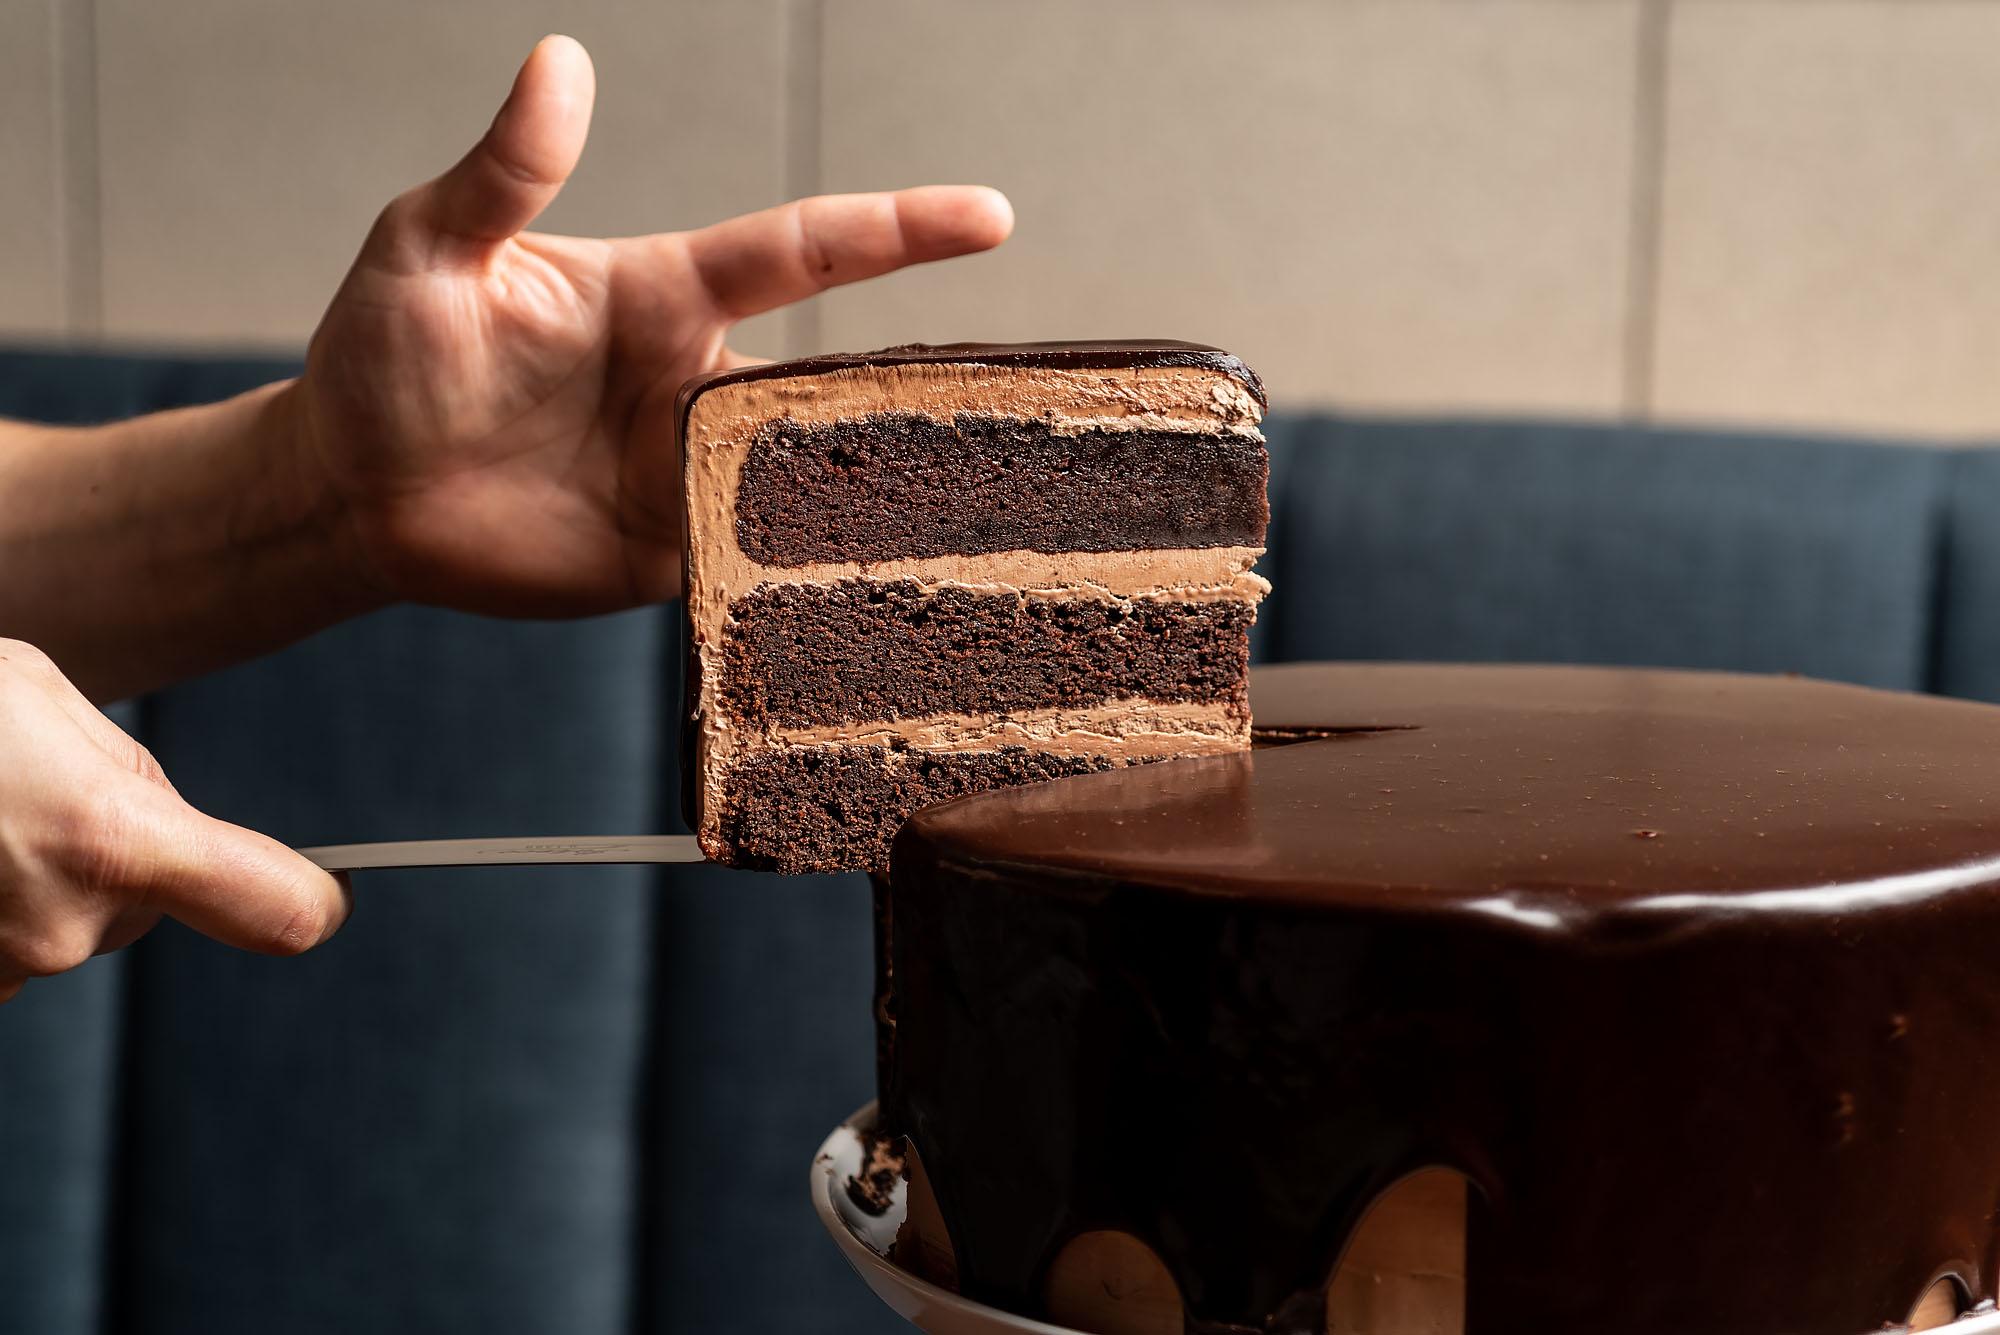 A massive slice of chocolate cake.